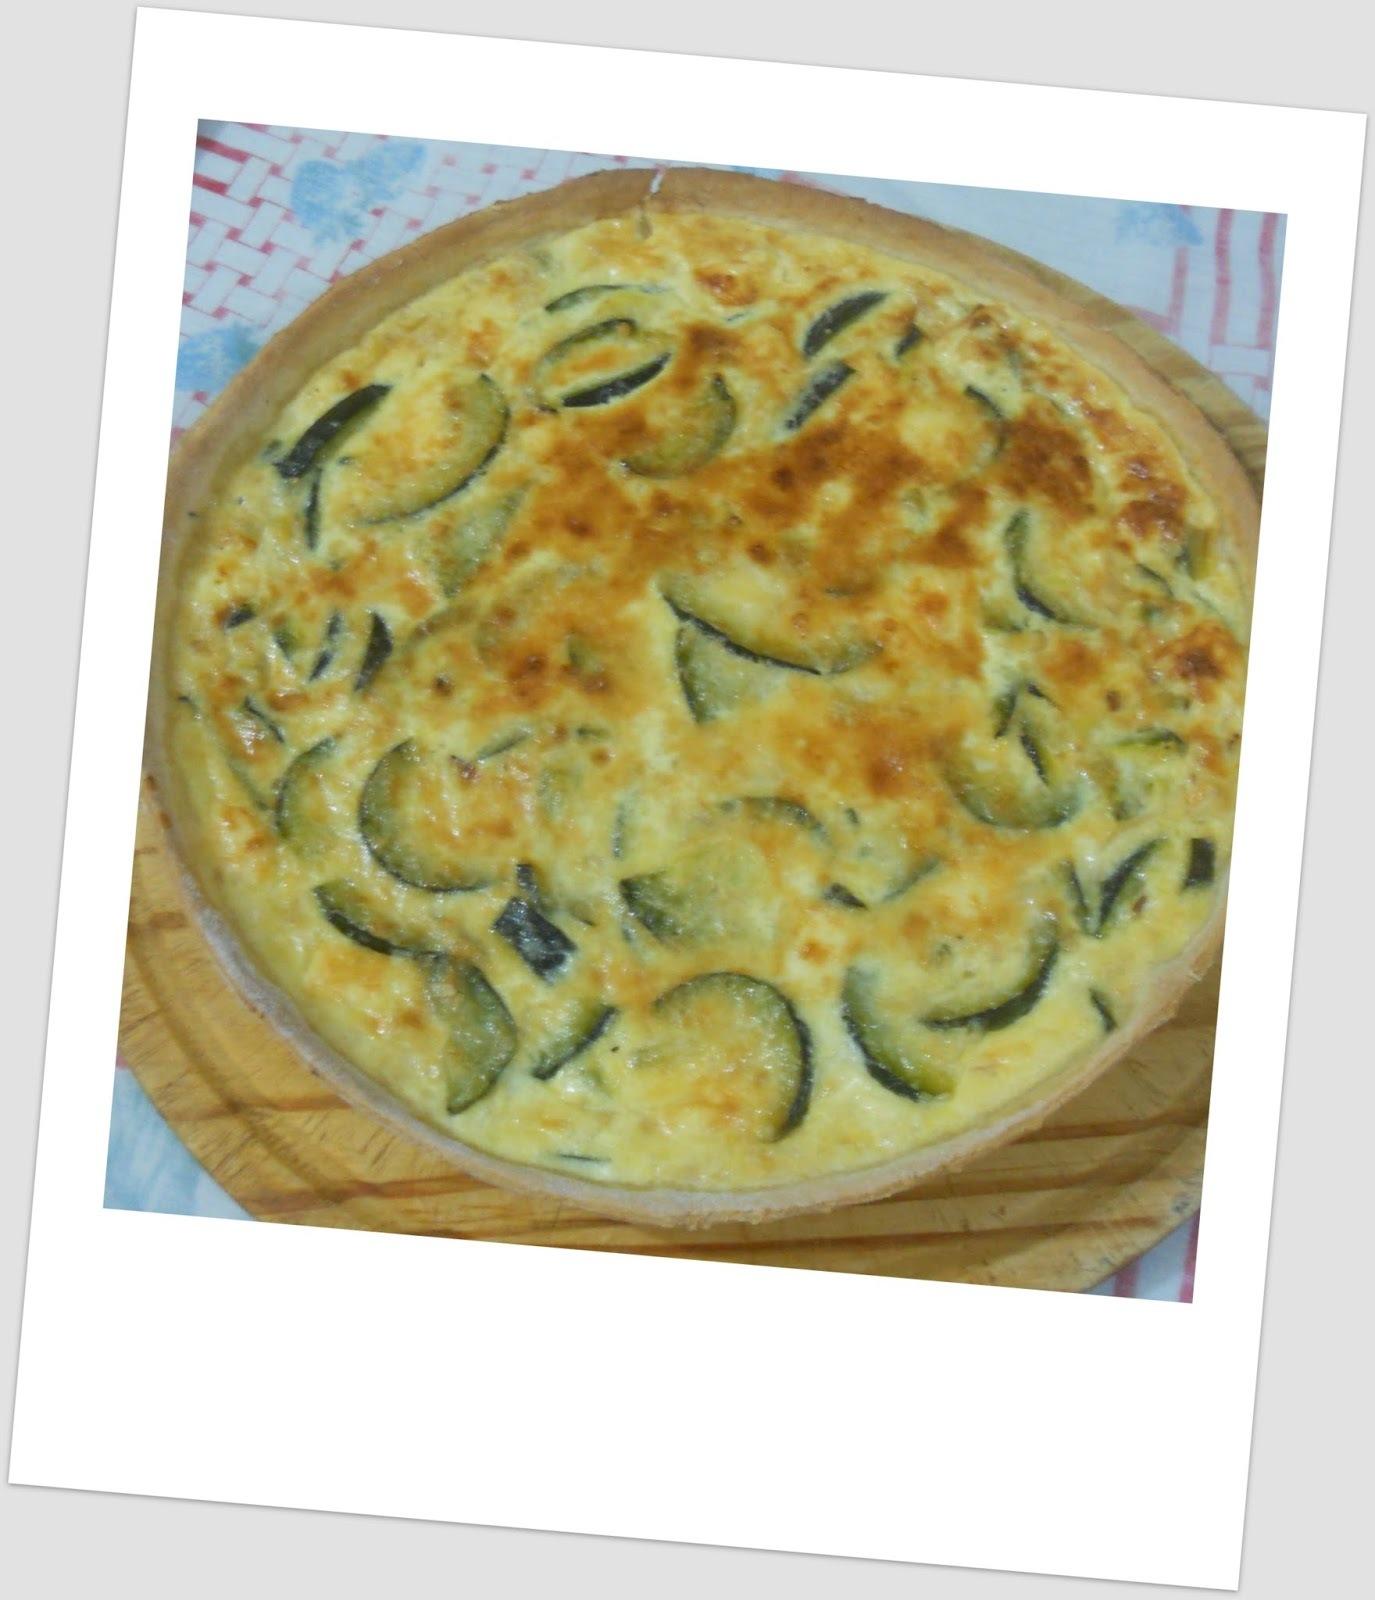 relleno tarta de zapallitos verdes